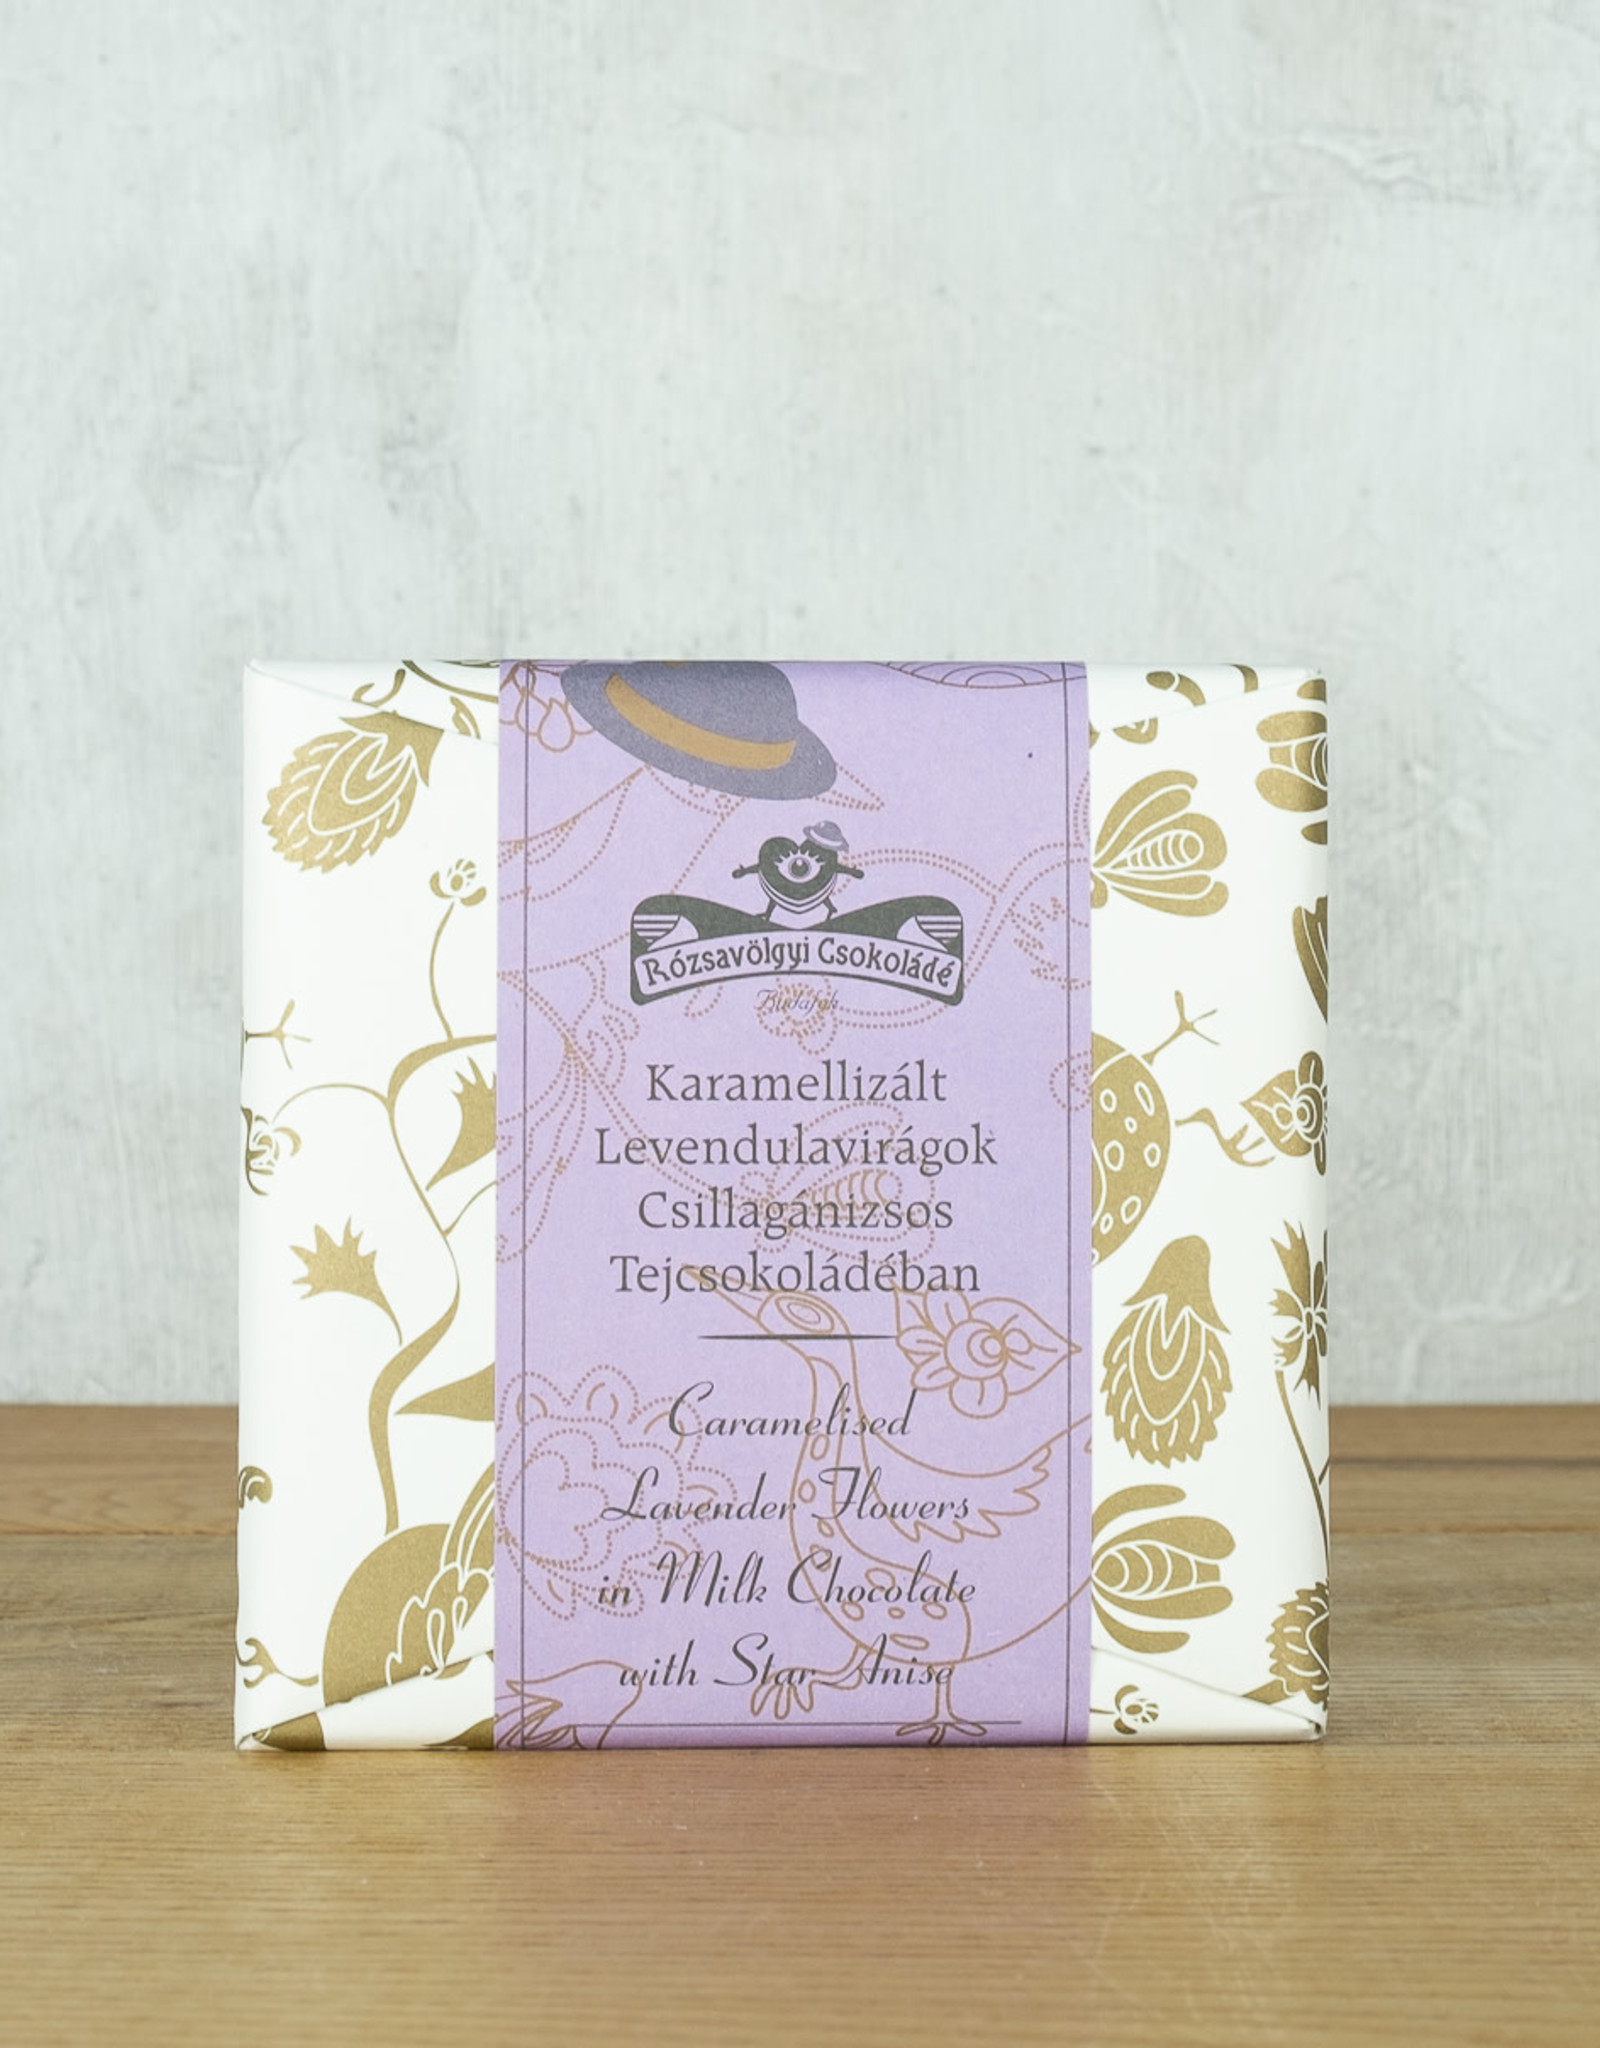 Rozsavolgyi Csokolade Milk Chocolate with Caramelized Lavender